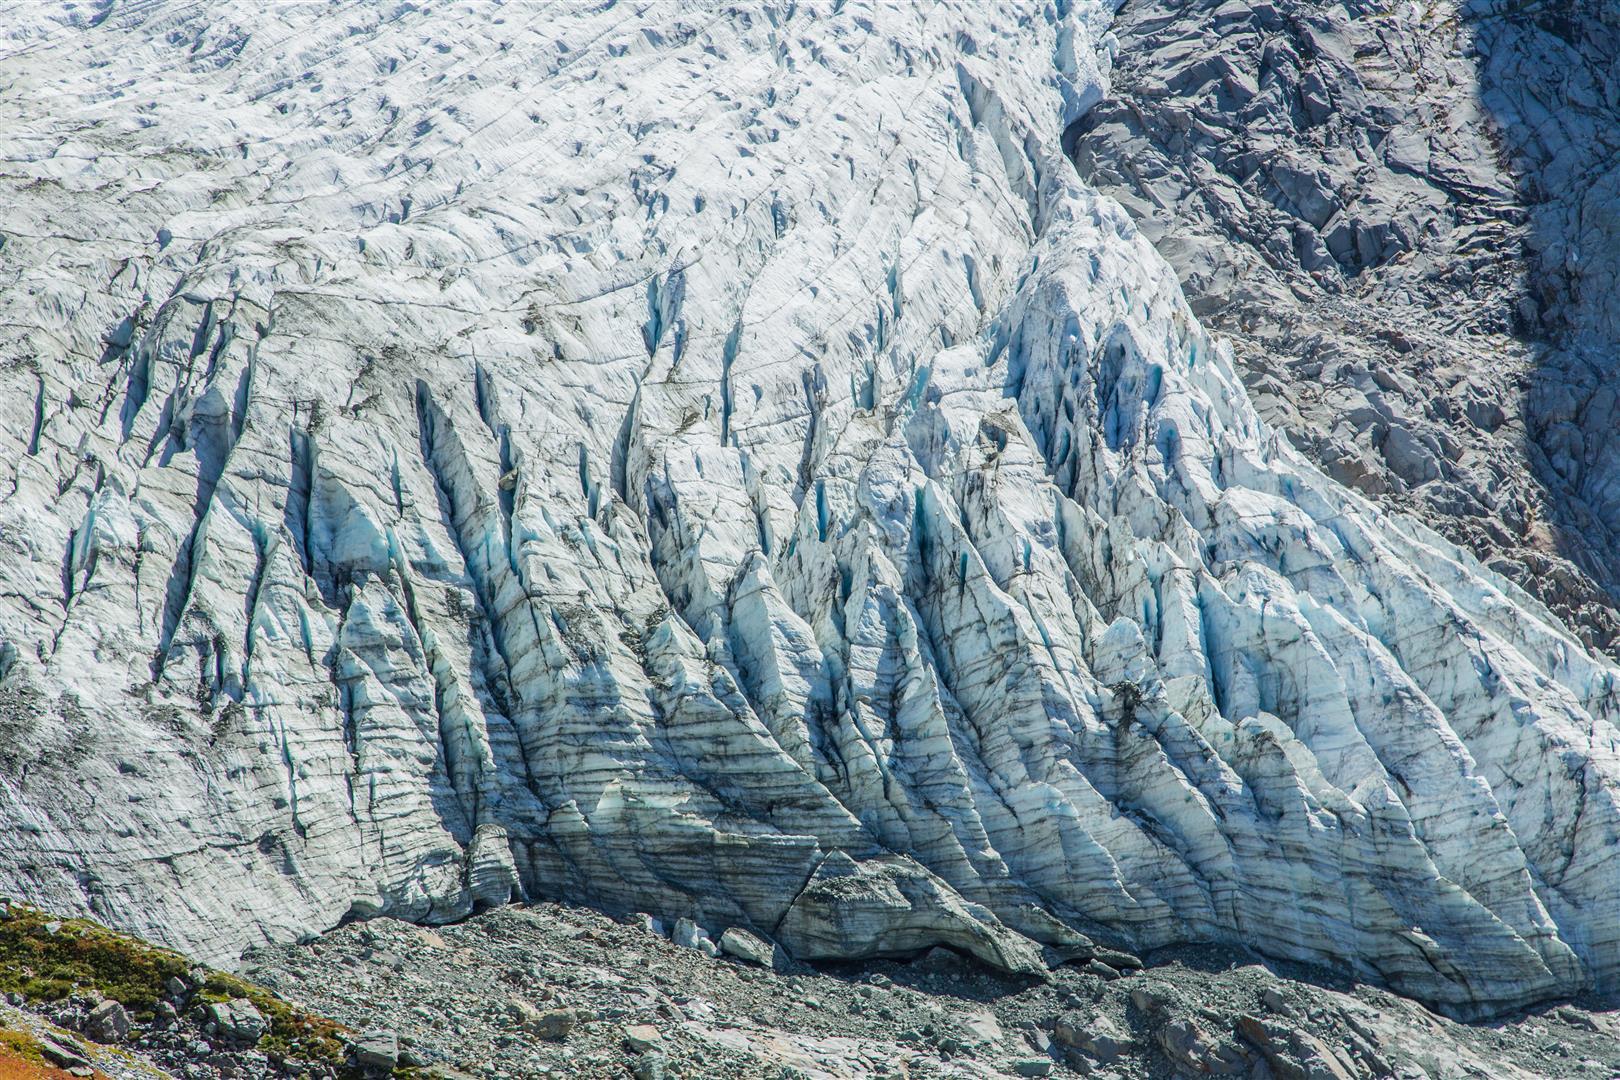 Lower Curtis Glacier detail